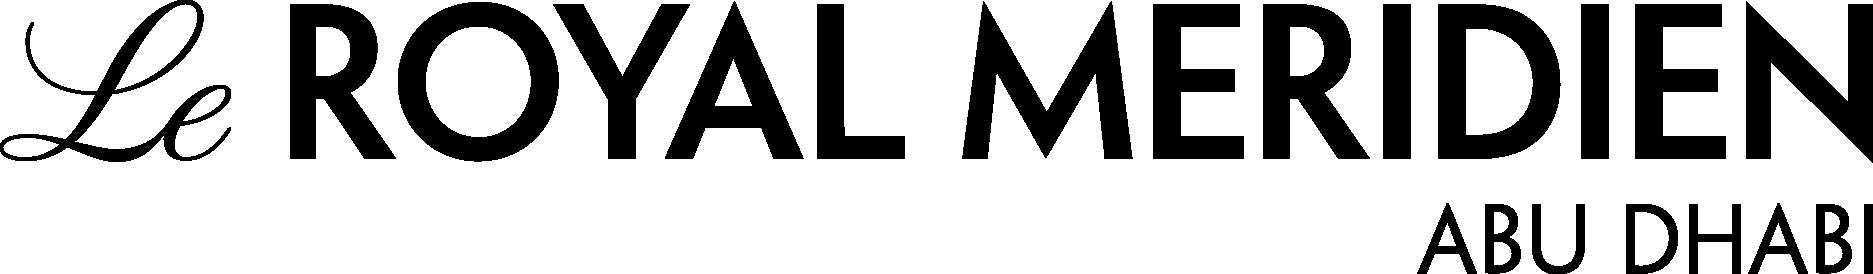 LeRoyalMeridienAD Logo